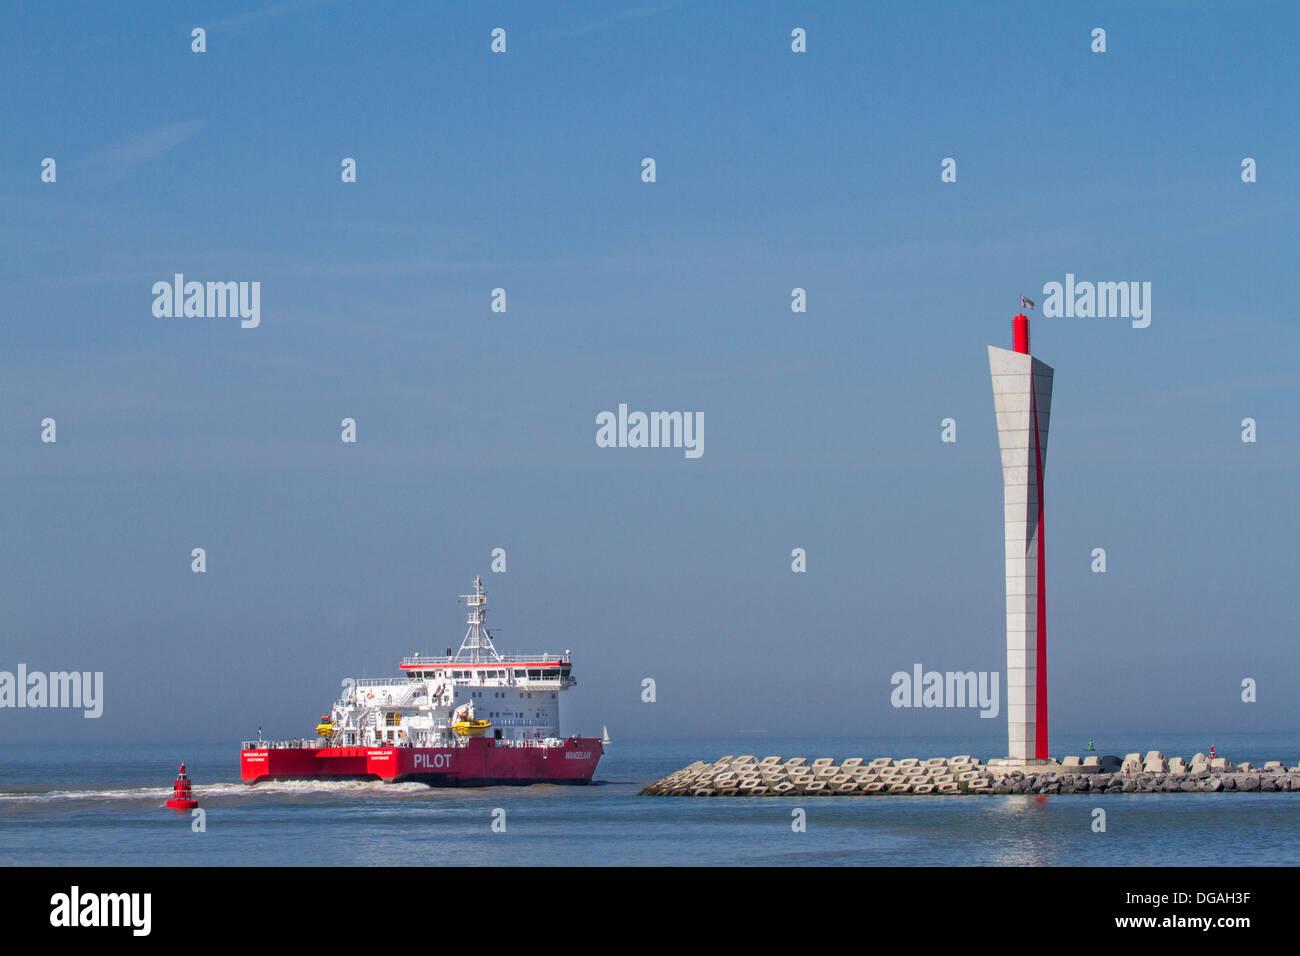 Pilot boat leaving the Ostend harbour past radar tower on the longitudinal embankment along the North Sea coast, Belgium - Stock Image